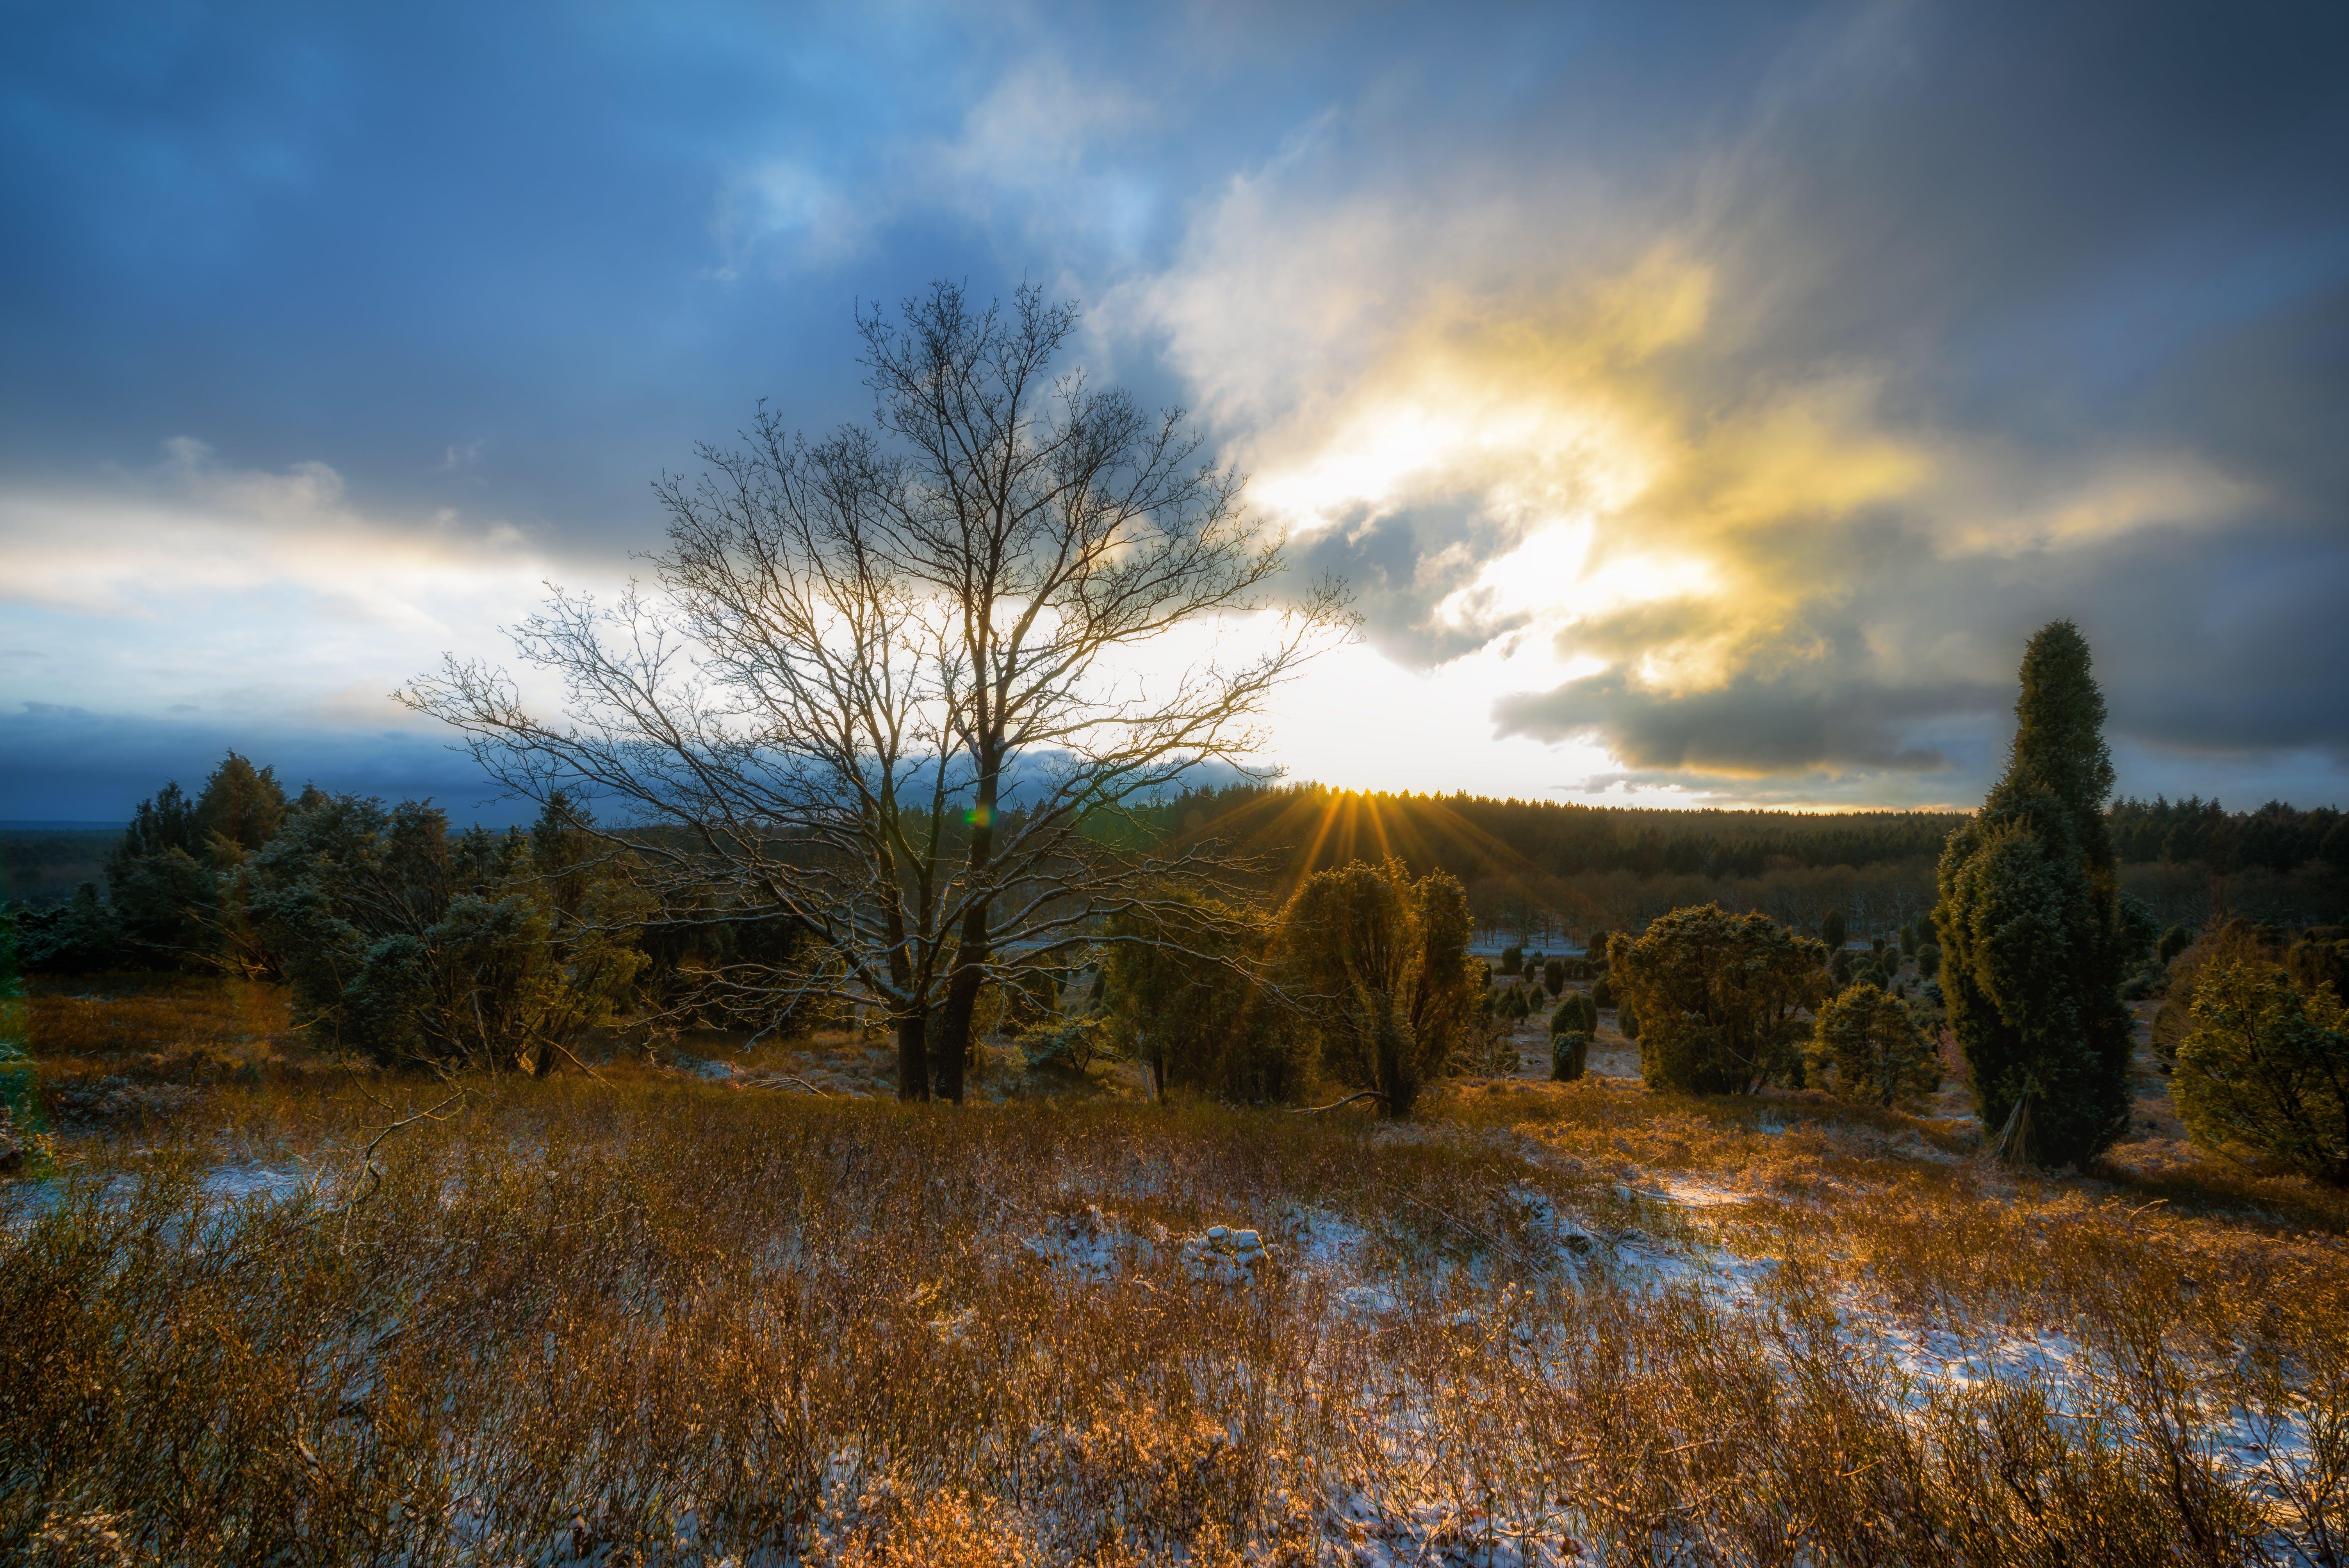 Gratis arkivbilde med daggry, gress, heier, himmel